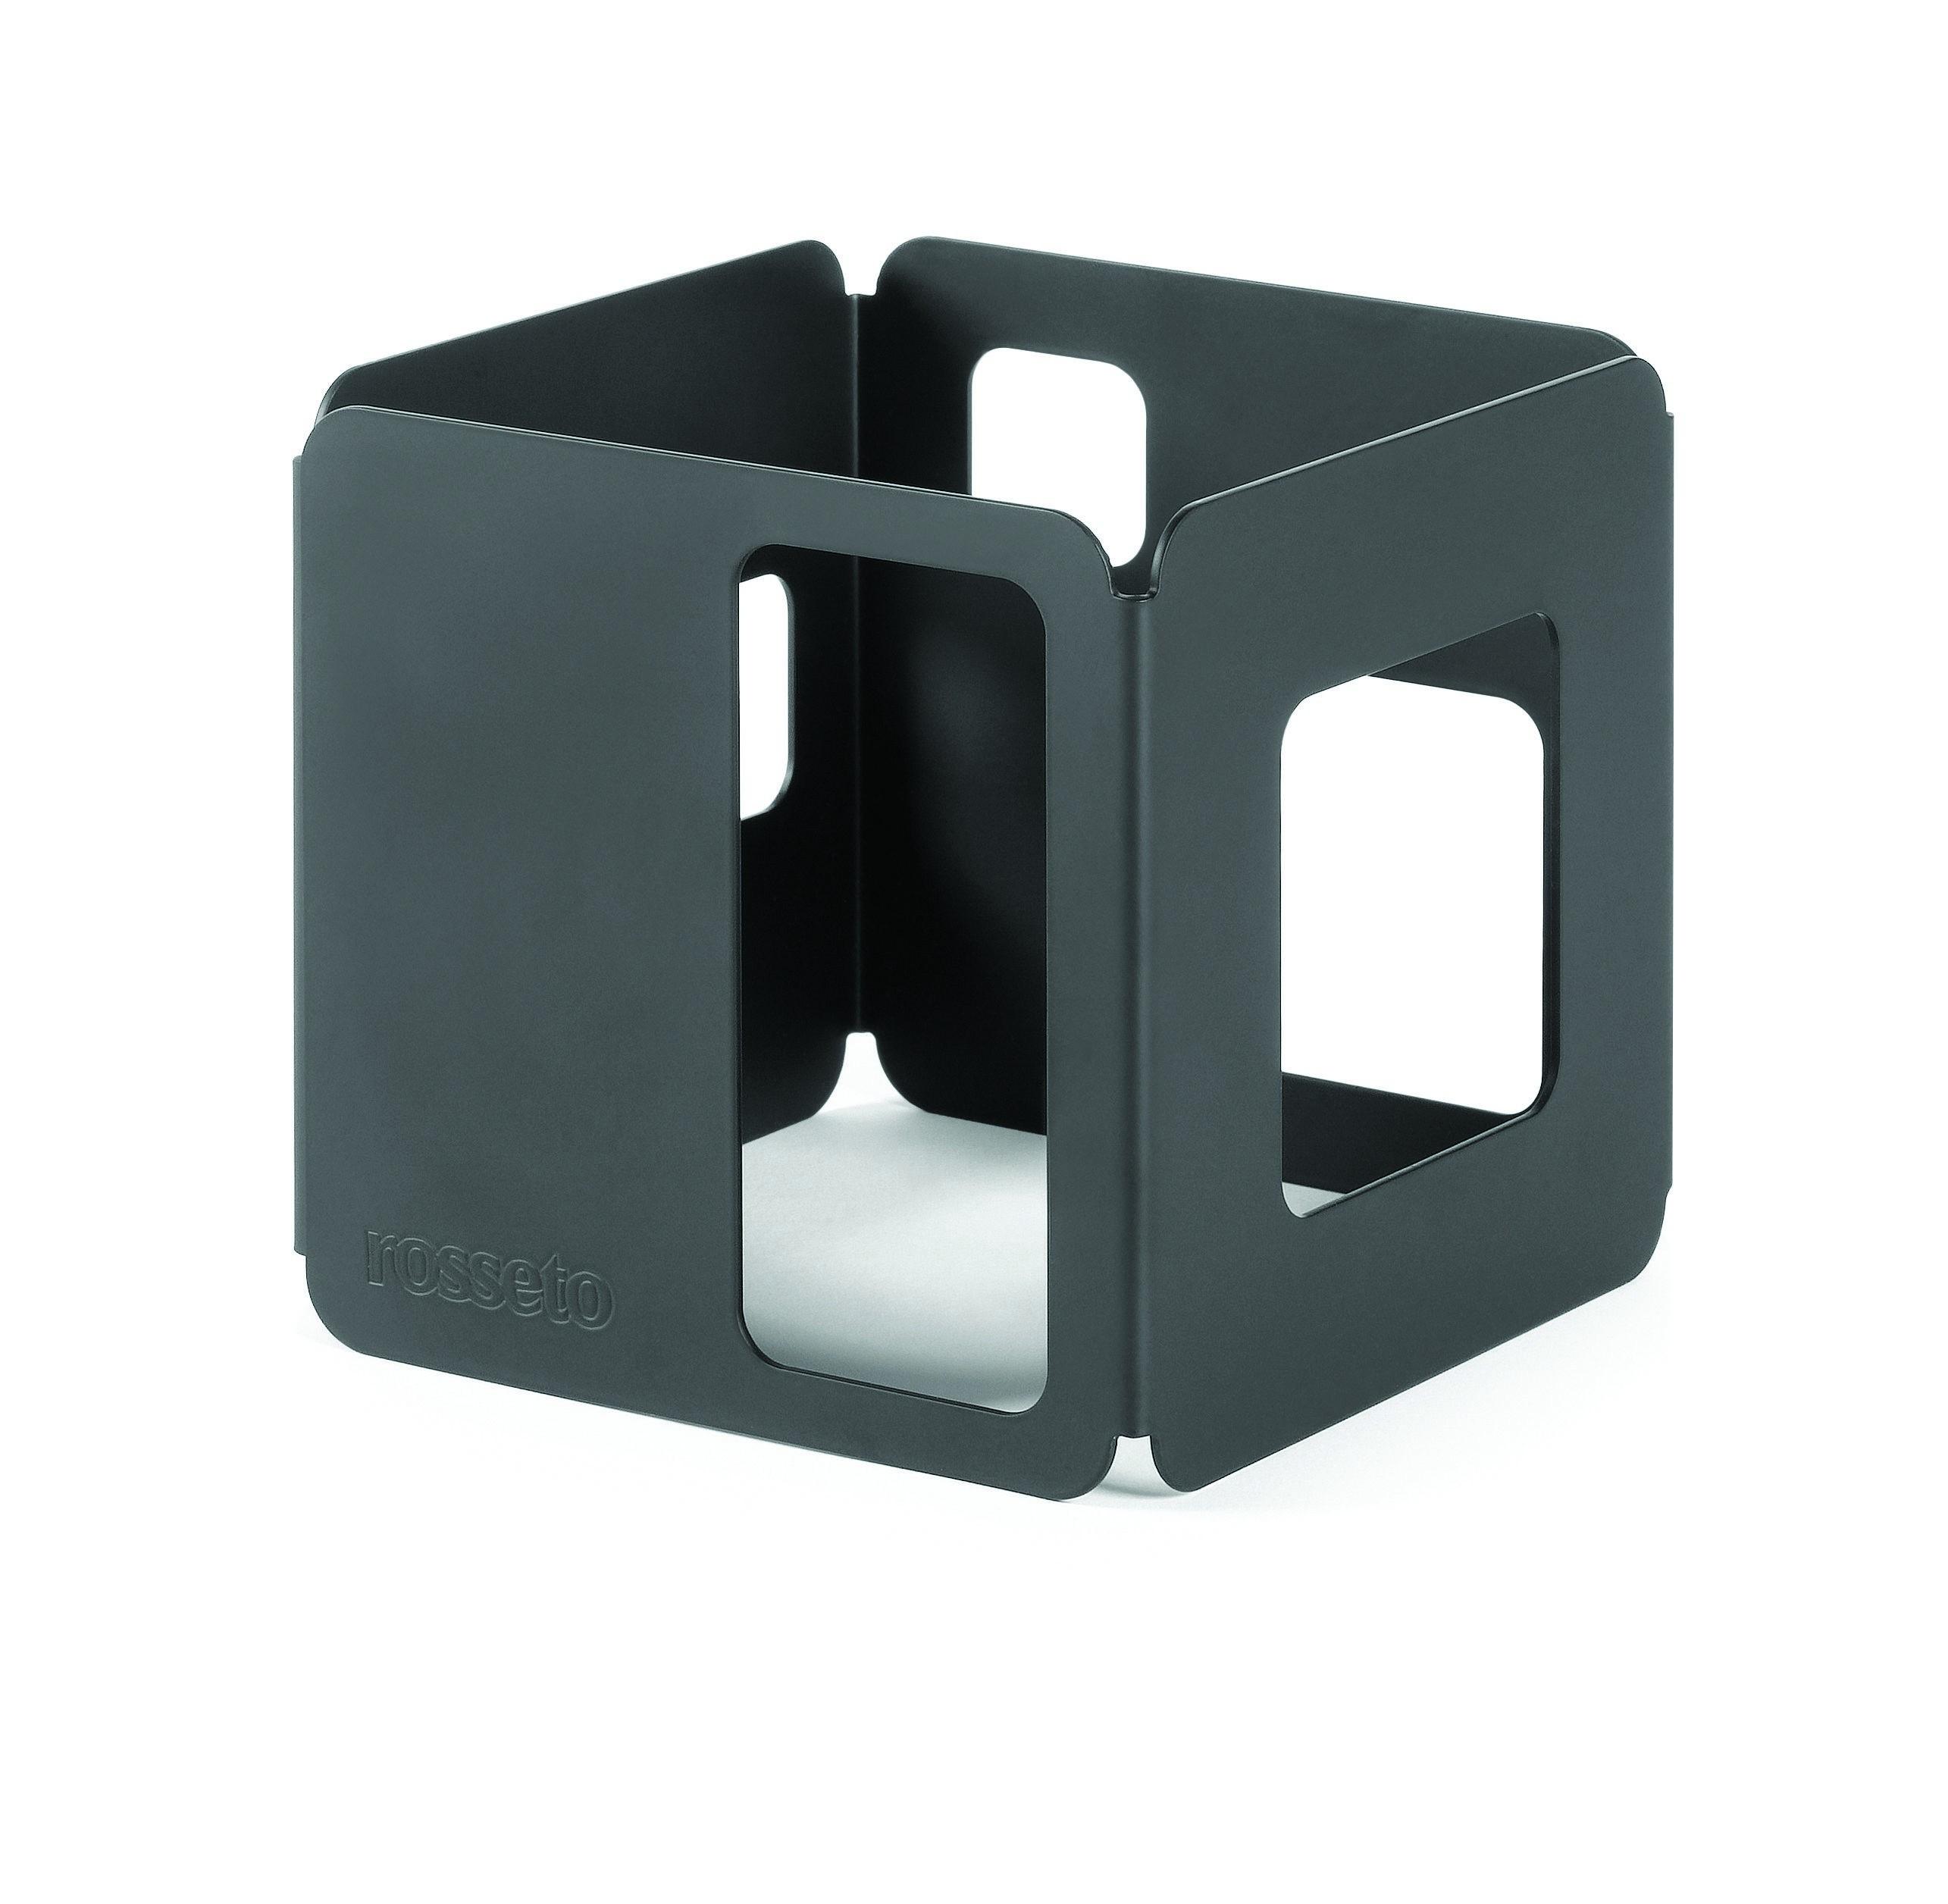 "Rosseto SM128 Black Matte Steel Tall Square Riser 6"" x 6"" x 6""H"